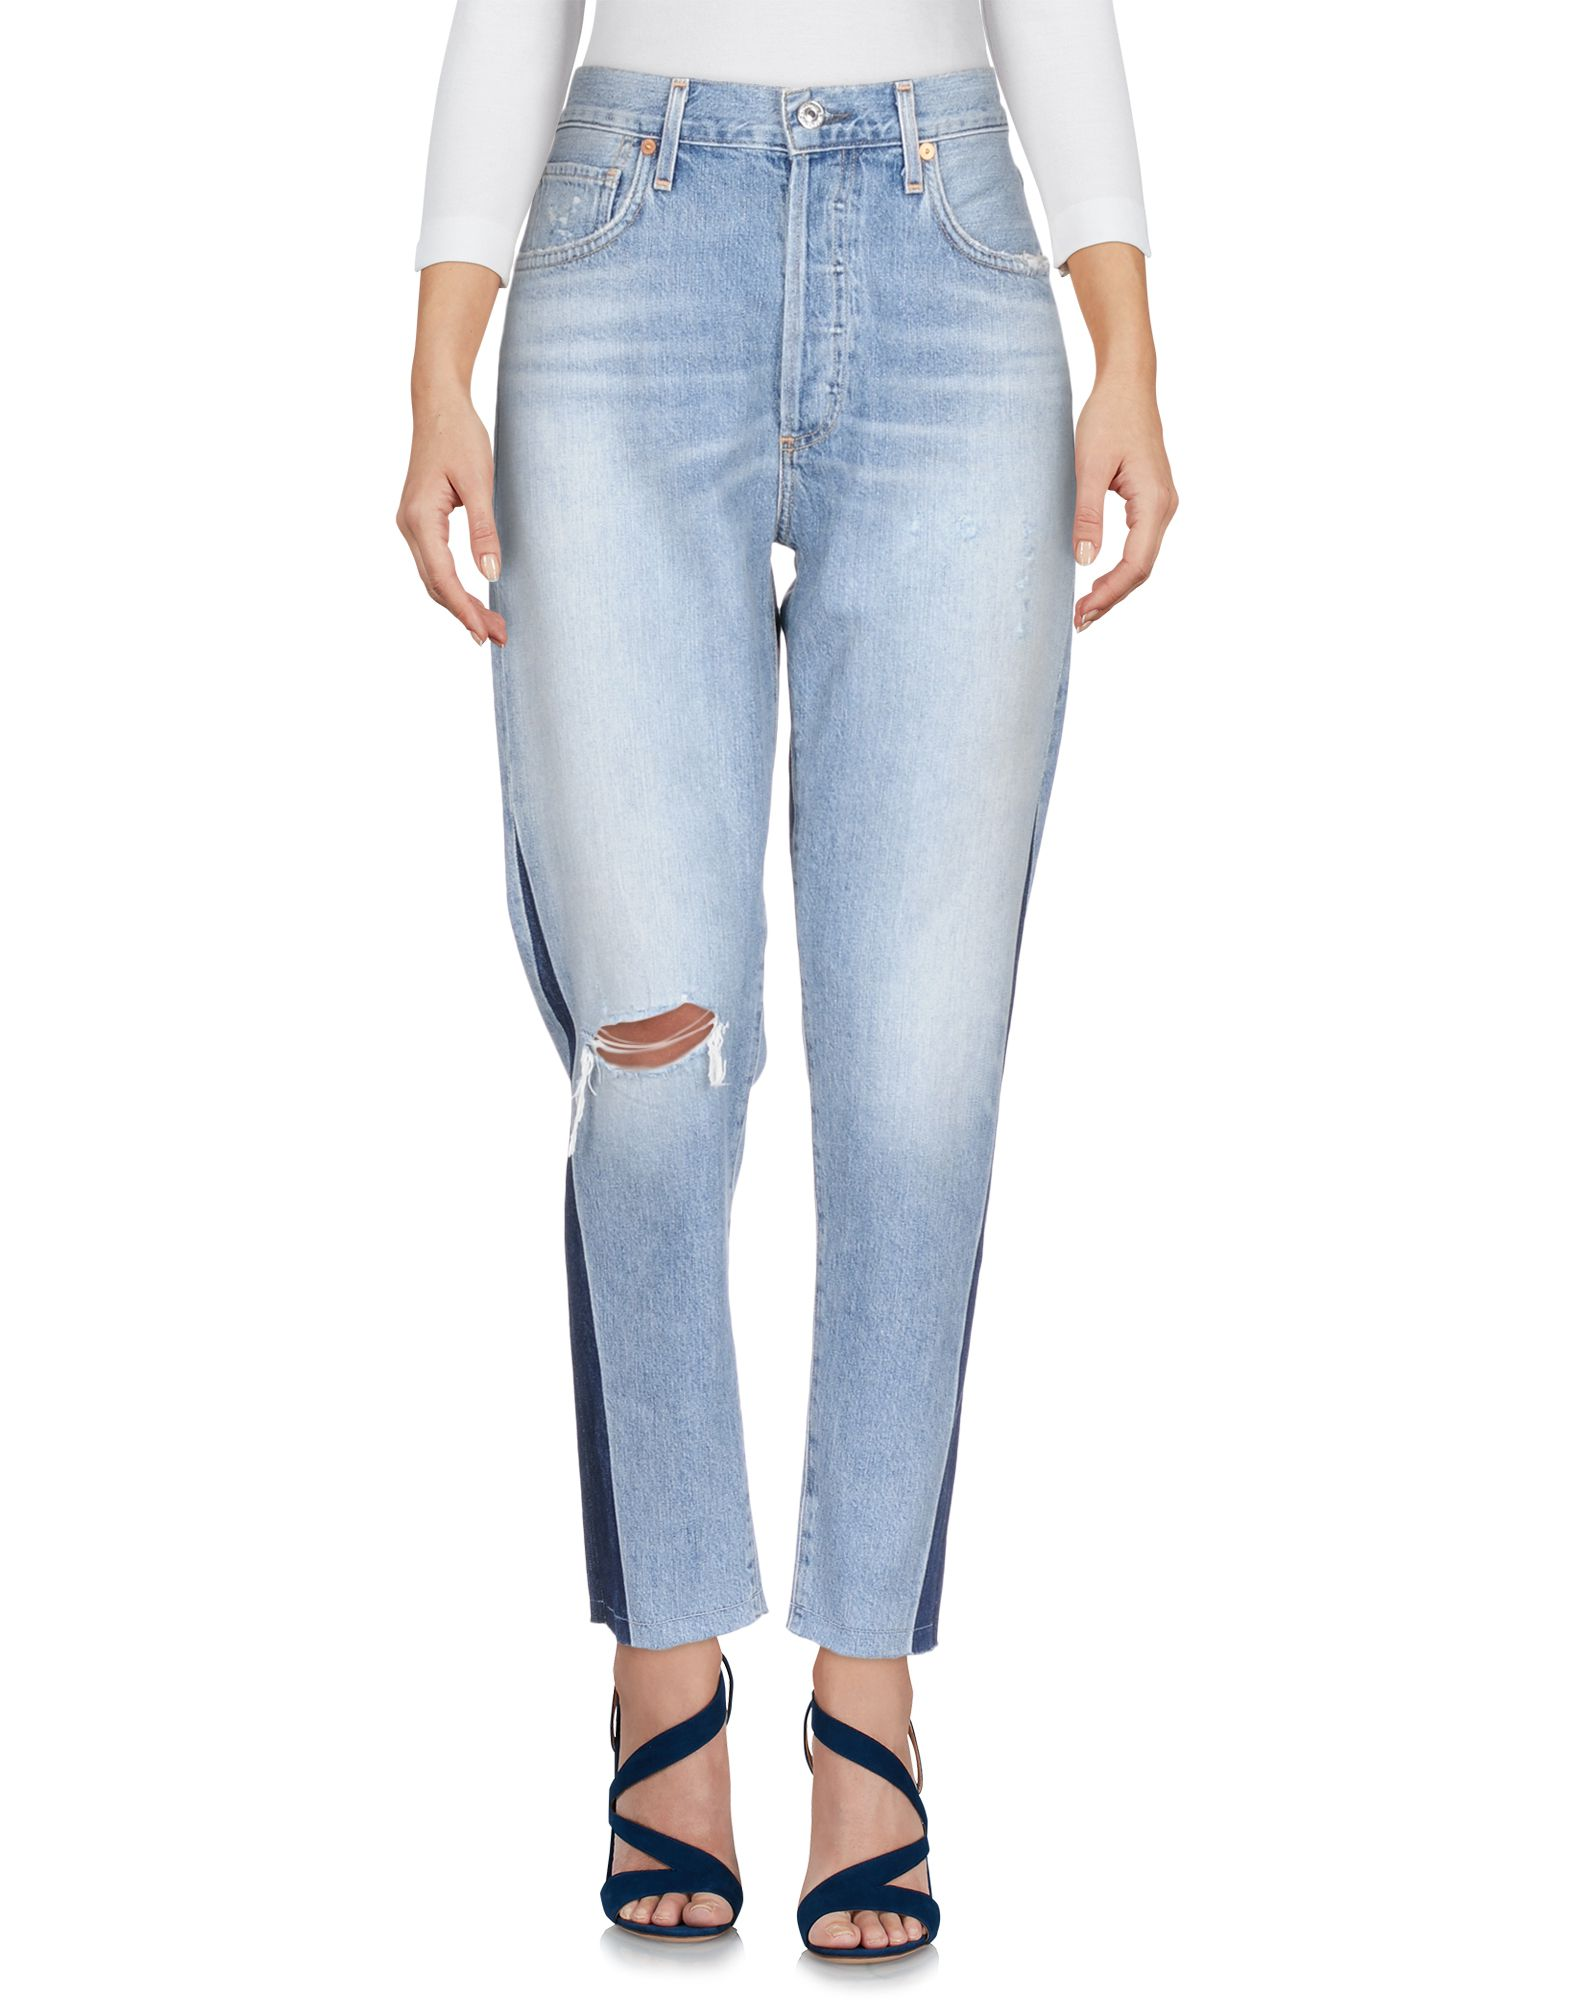 Pantaloni Jeans Citizens Of Humanity Donna - Acquista online su TgCIHc2